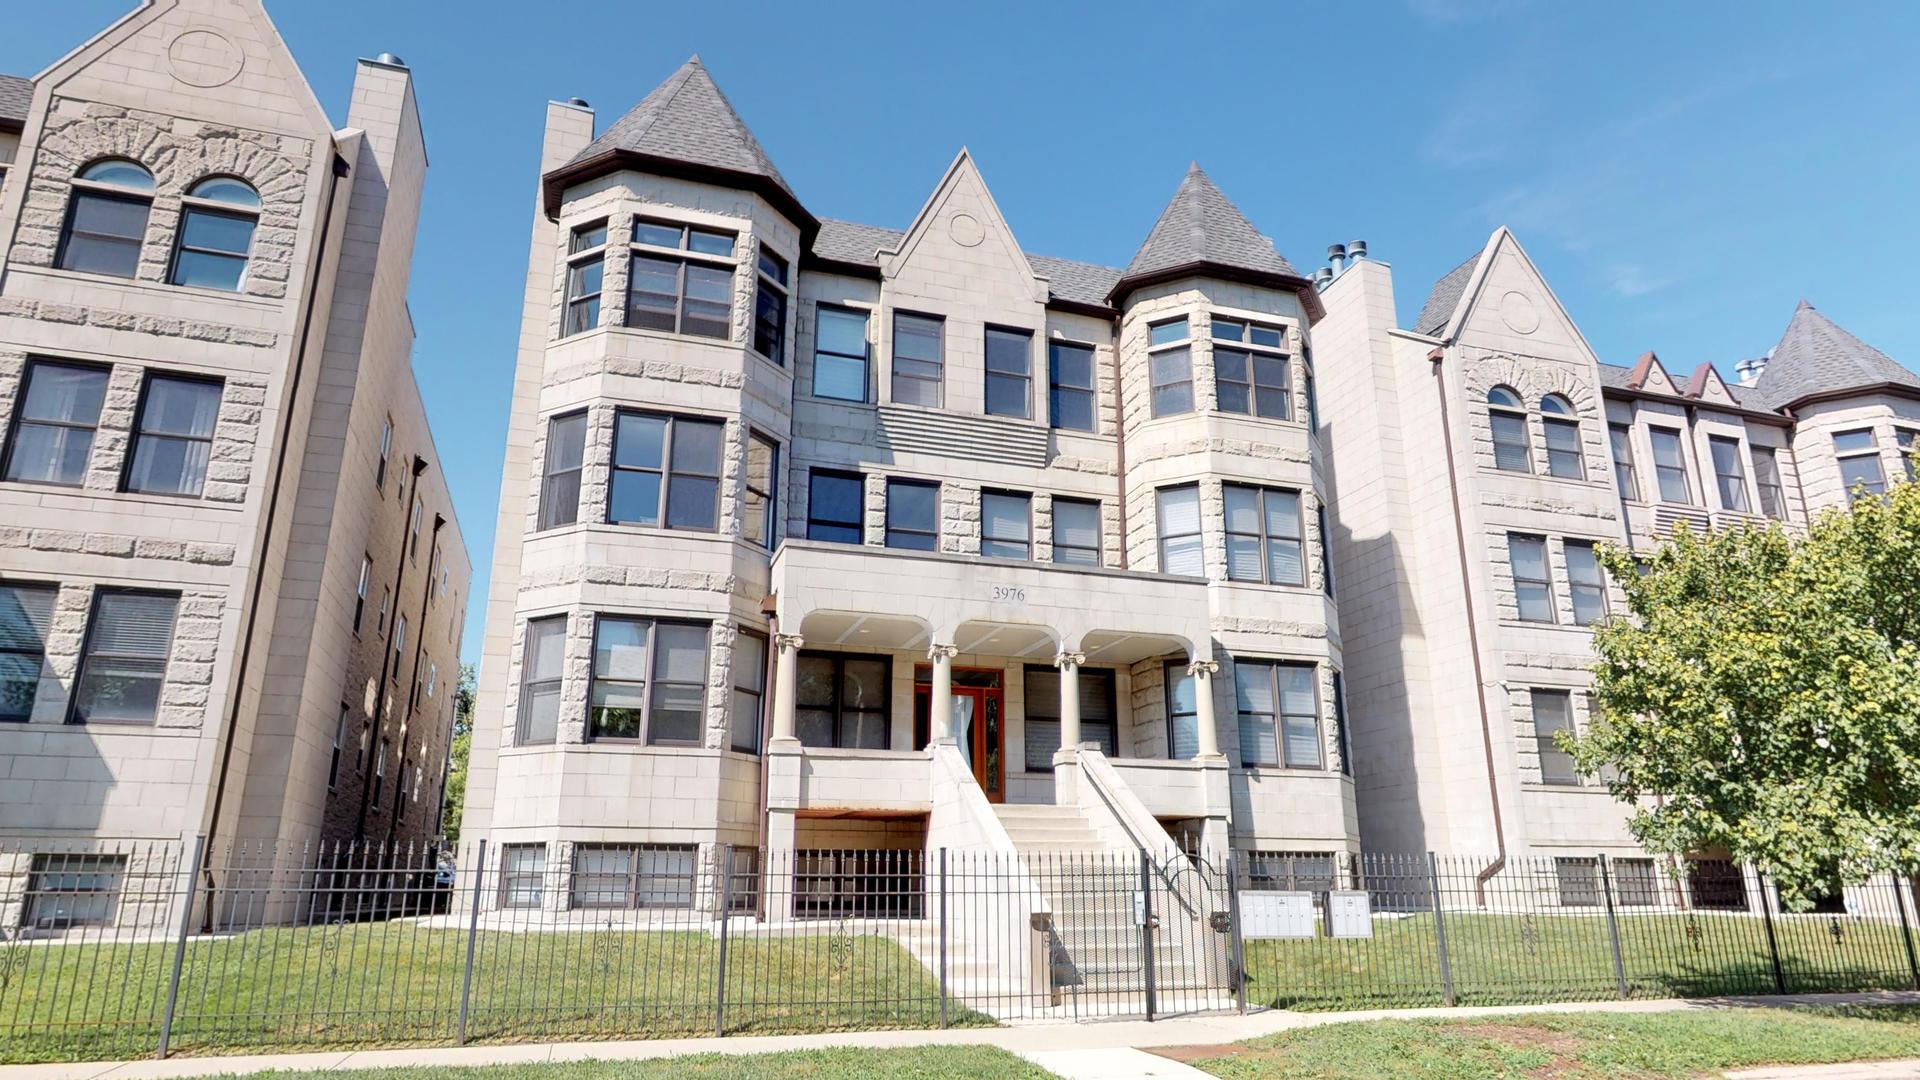 3976 South Ellis Avenue, Kenwood, Illinois